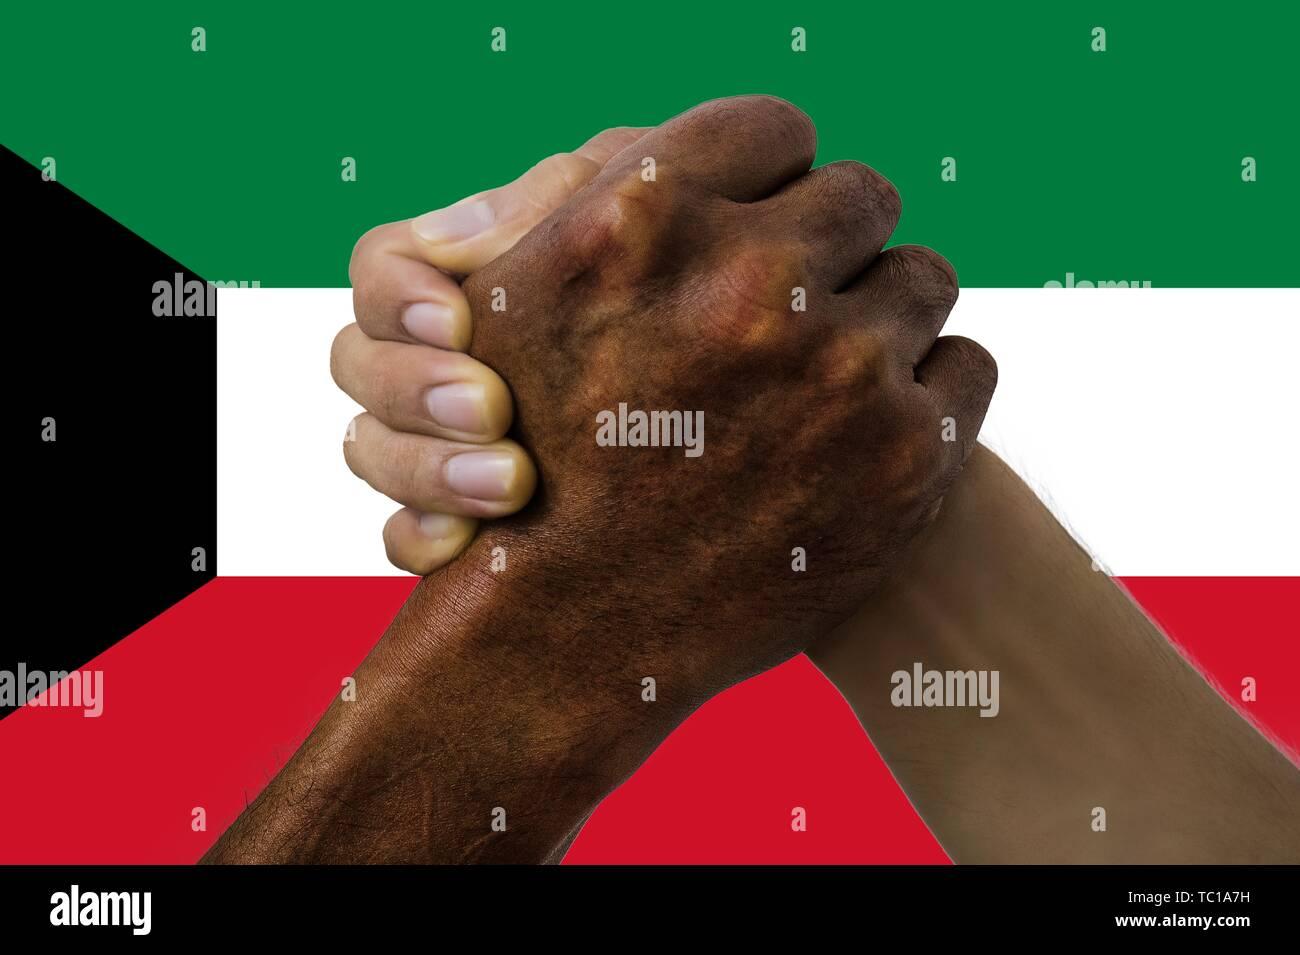 Kuwait People Stock Photos & Kuwait People Stock Images - Alamy